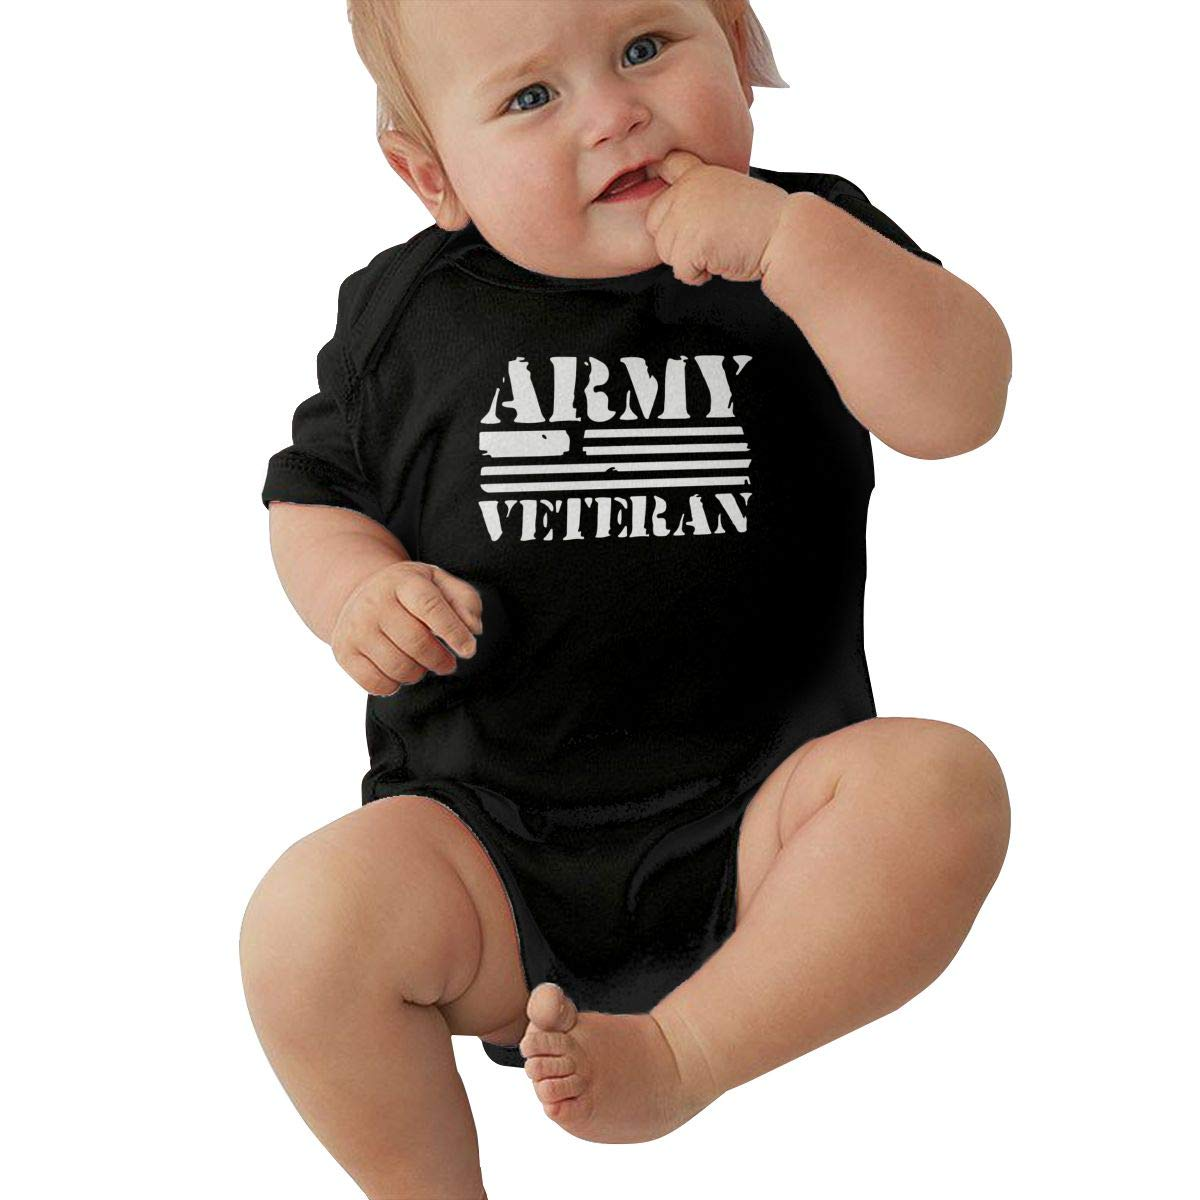 Flag Boys Comfortable 100/% Cotton Baby Onesie JUE/&YEE Army Veteran